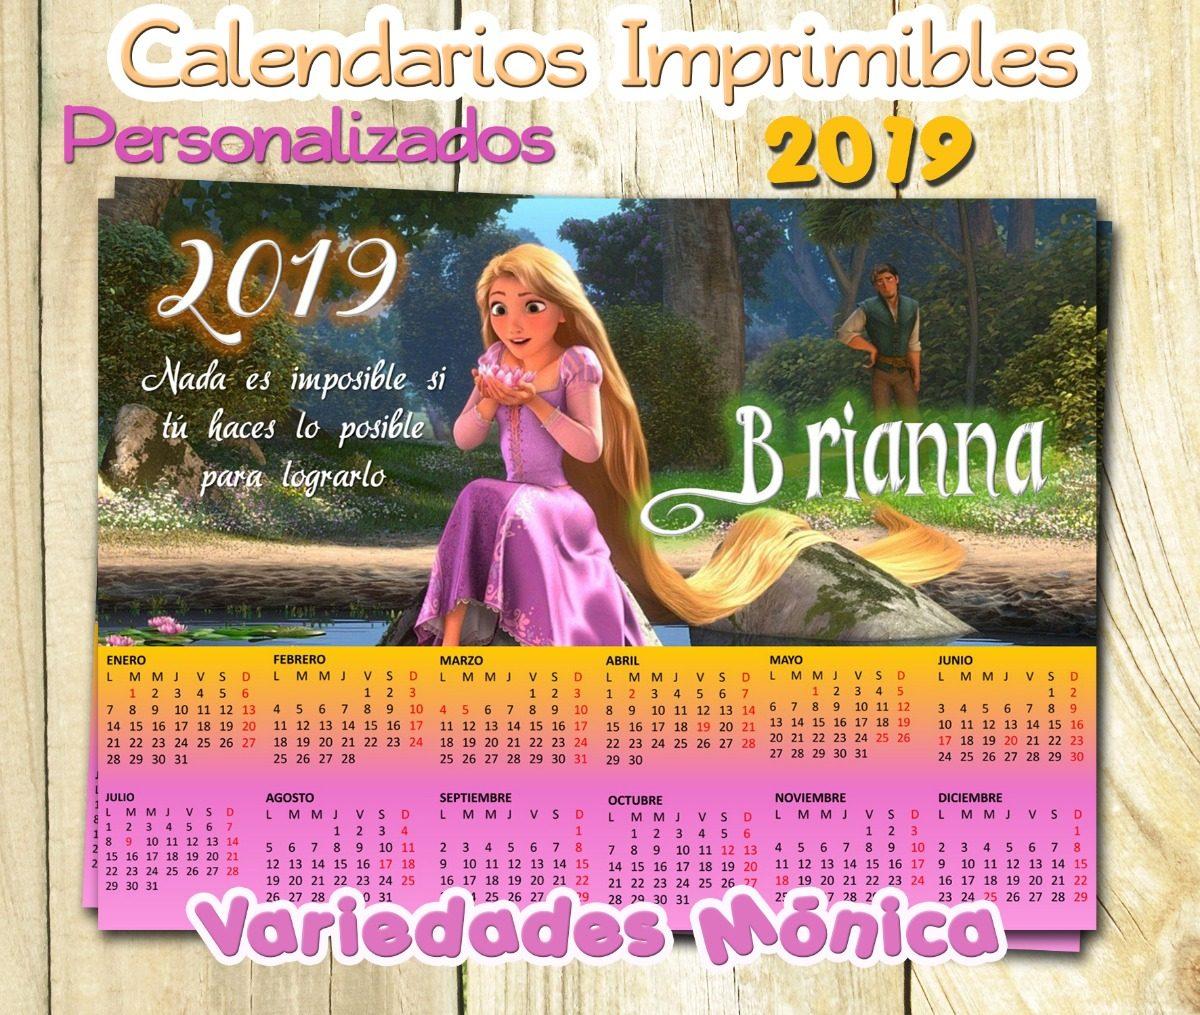 Calendario 2019 Disney Para Imprimir.Calendario Imprimible Personalizado Princesas Disney 2019